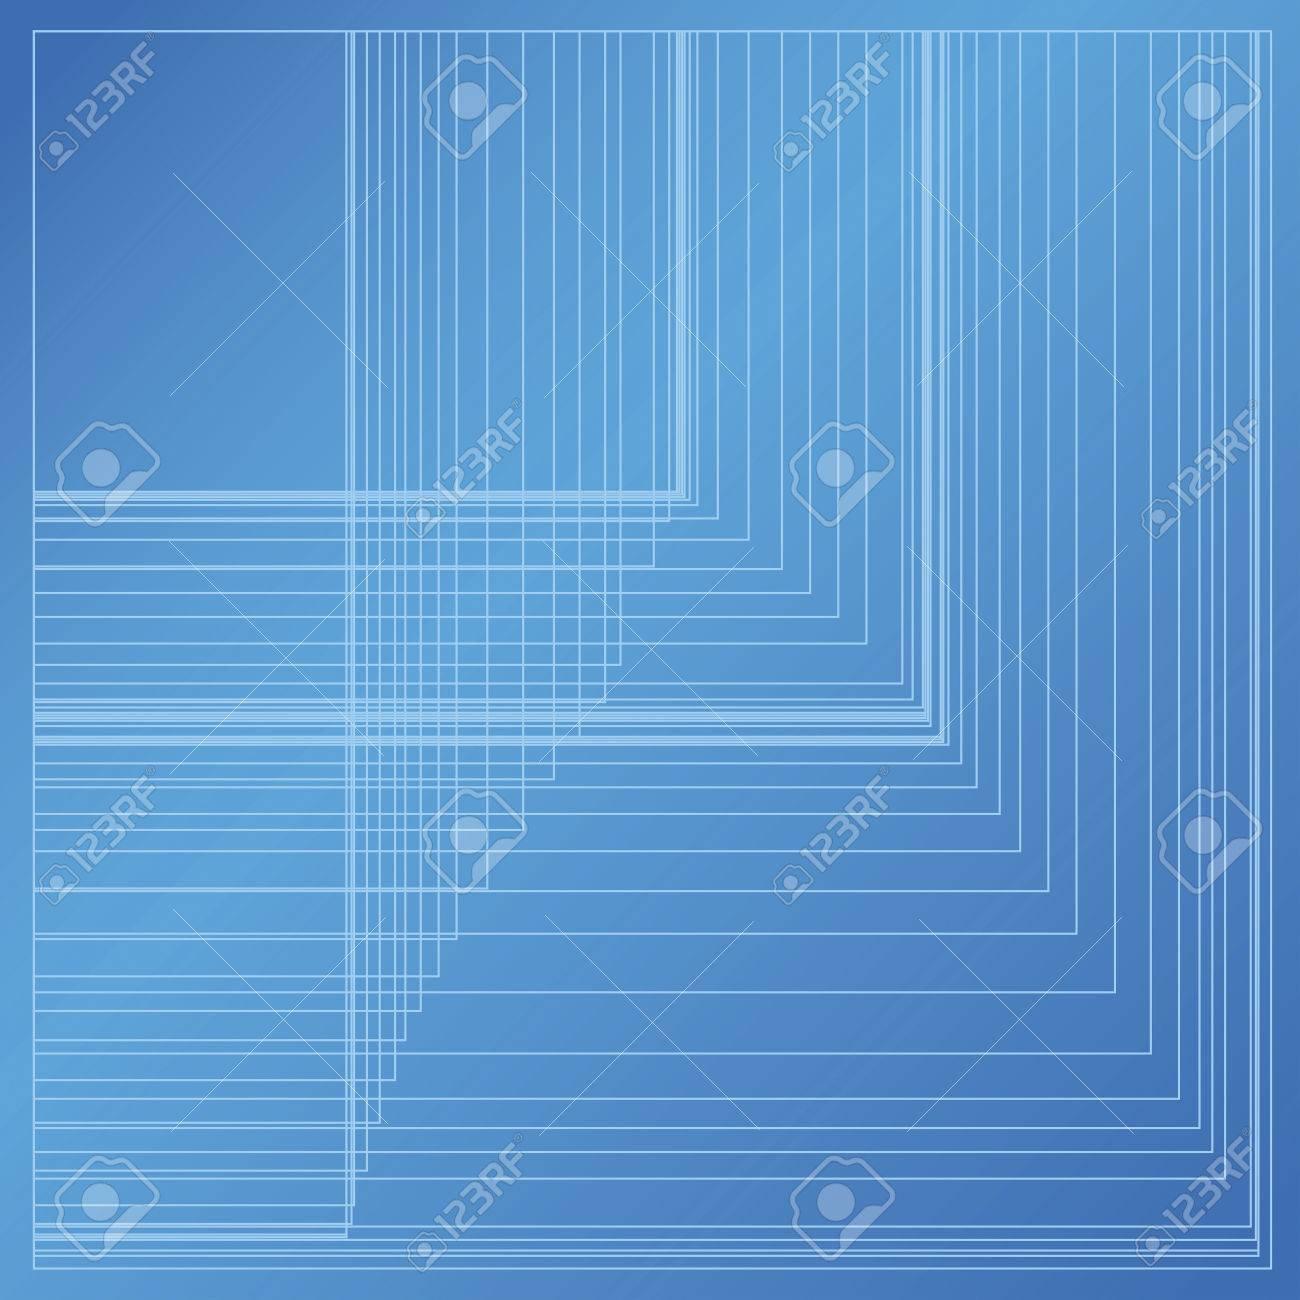 Blueprint background with abstract random rectangle grid on blue blueprint background with abstract random rectangle grid on blue paper stock vector 60146262 malvernweather Choice Image